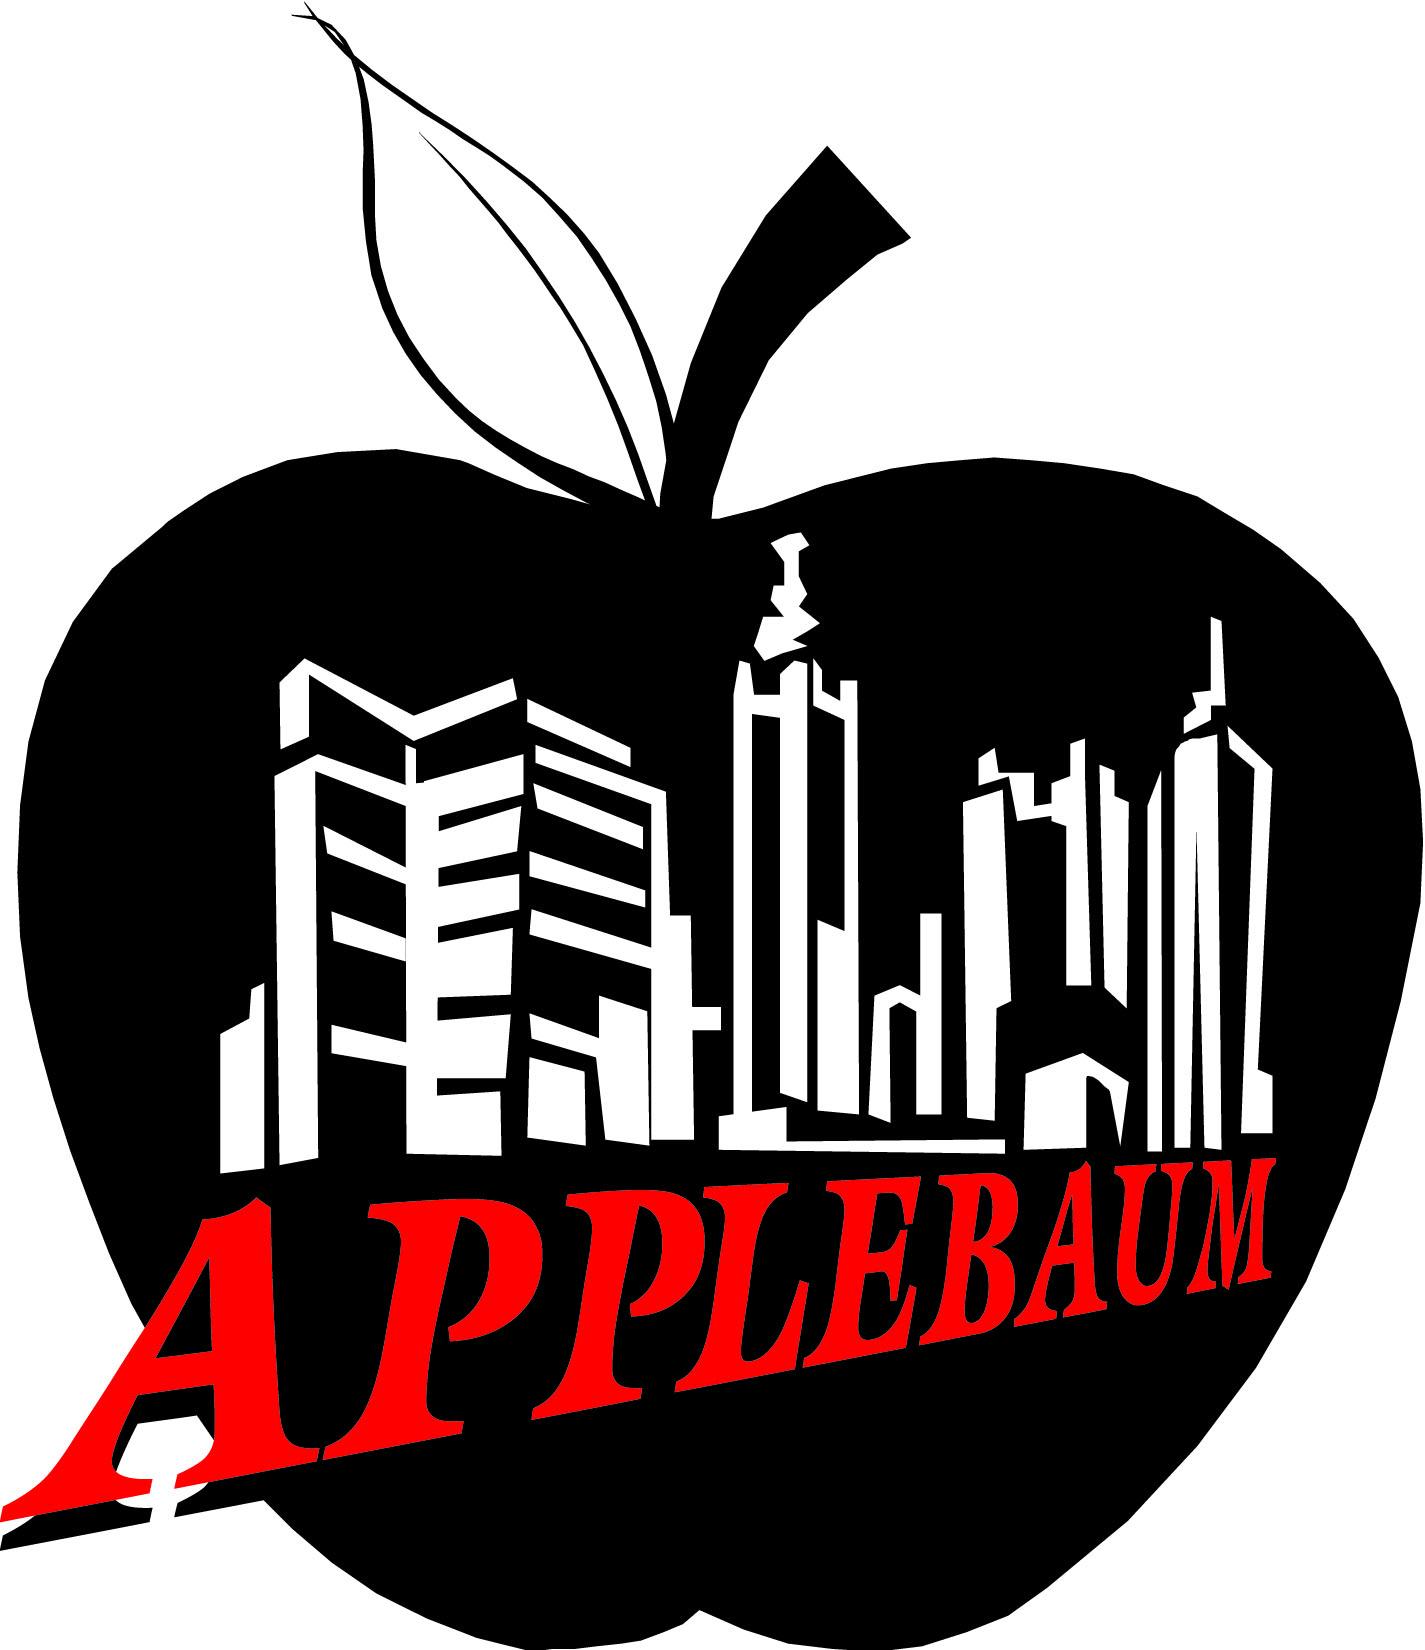 Applebaum_Logo_clr_no_tag.jpg